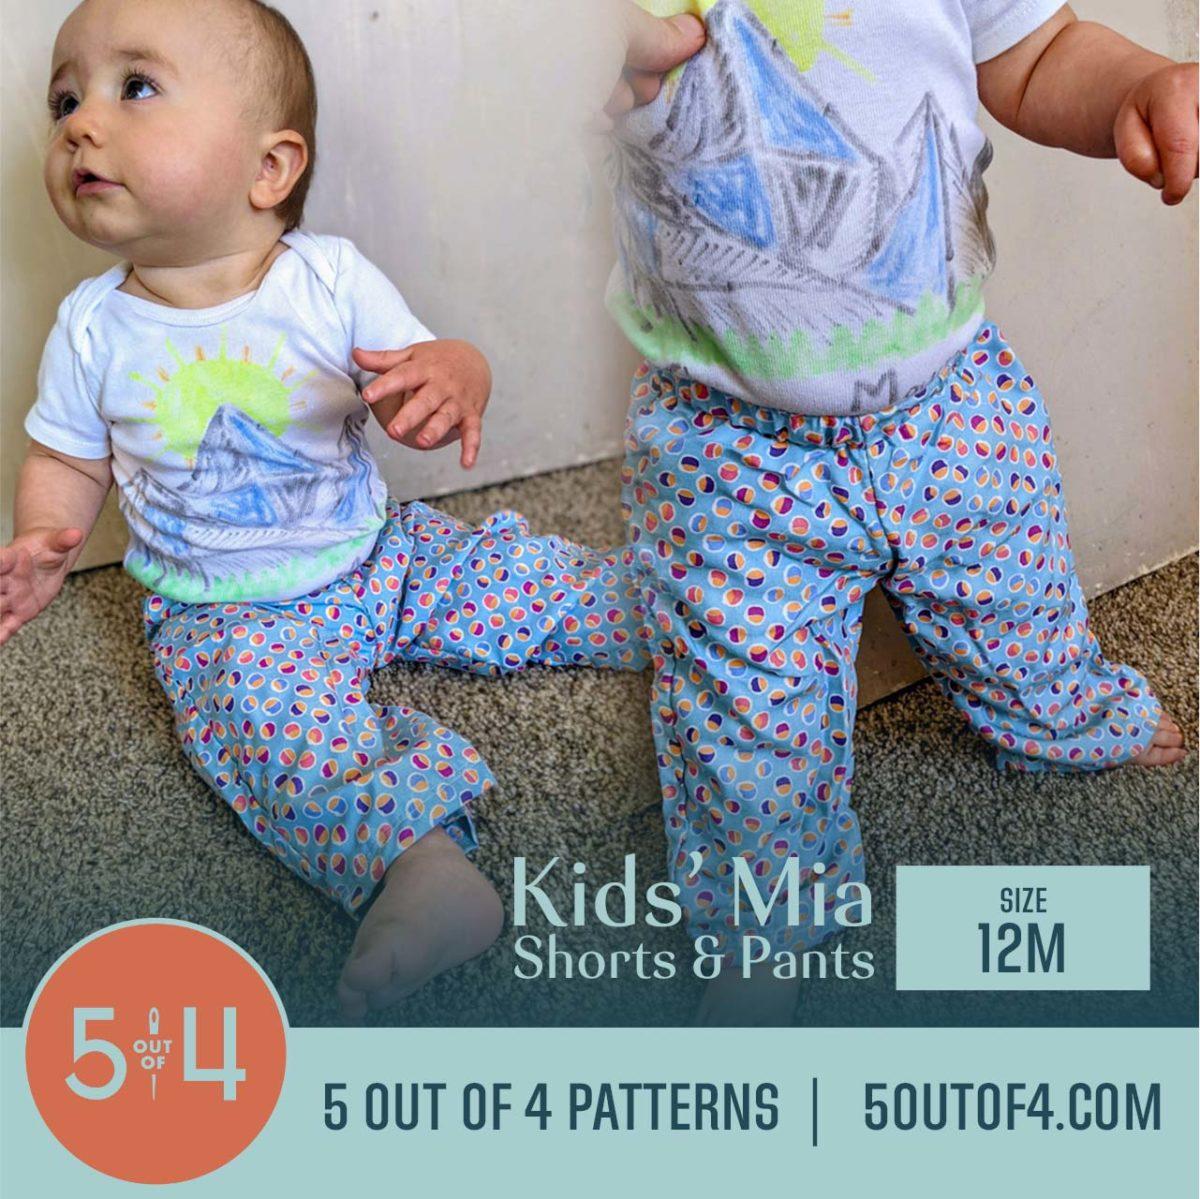 5oo4 Patterns Kids' Mia Pants Size 12M